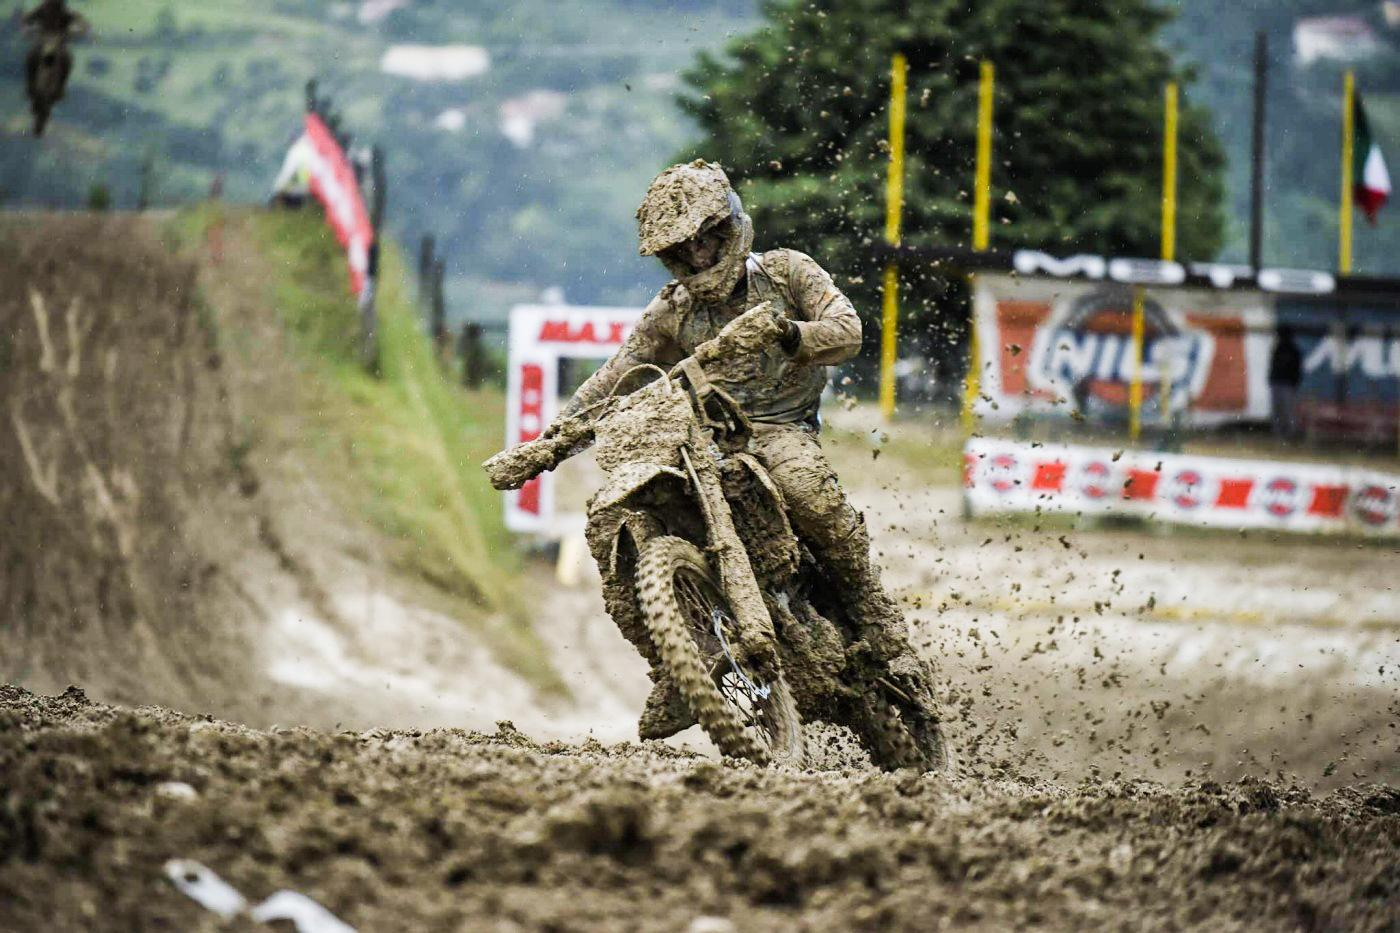 Cingoli Al via il campionato italiano Motocross mud